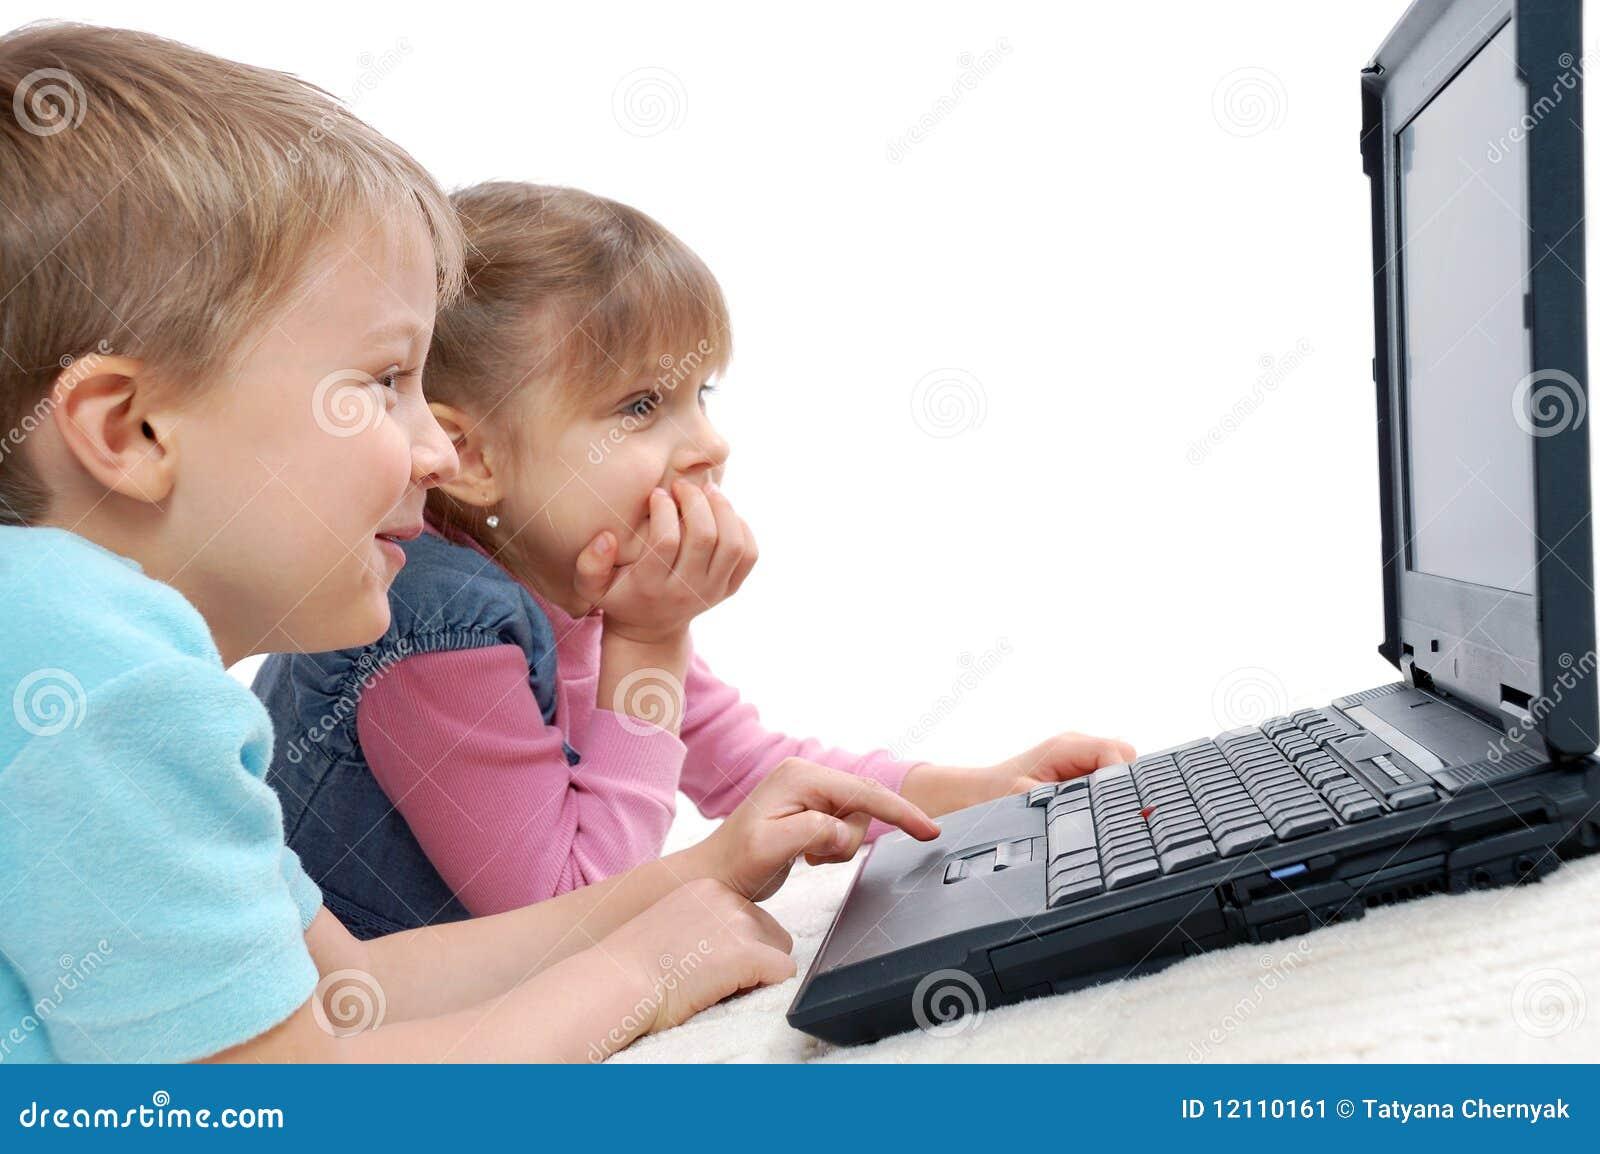 spiele kinder computer